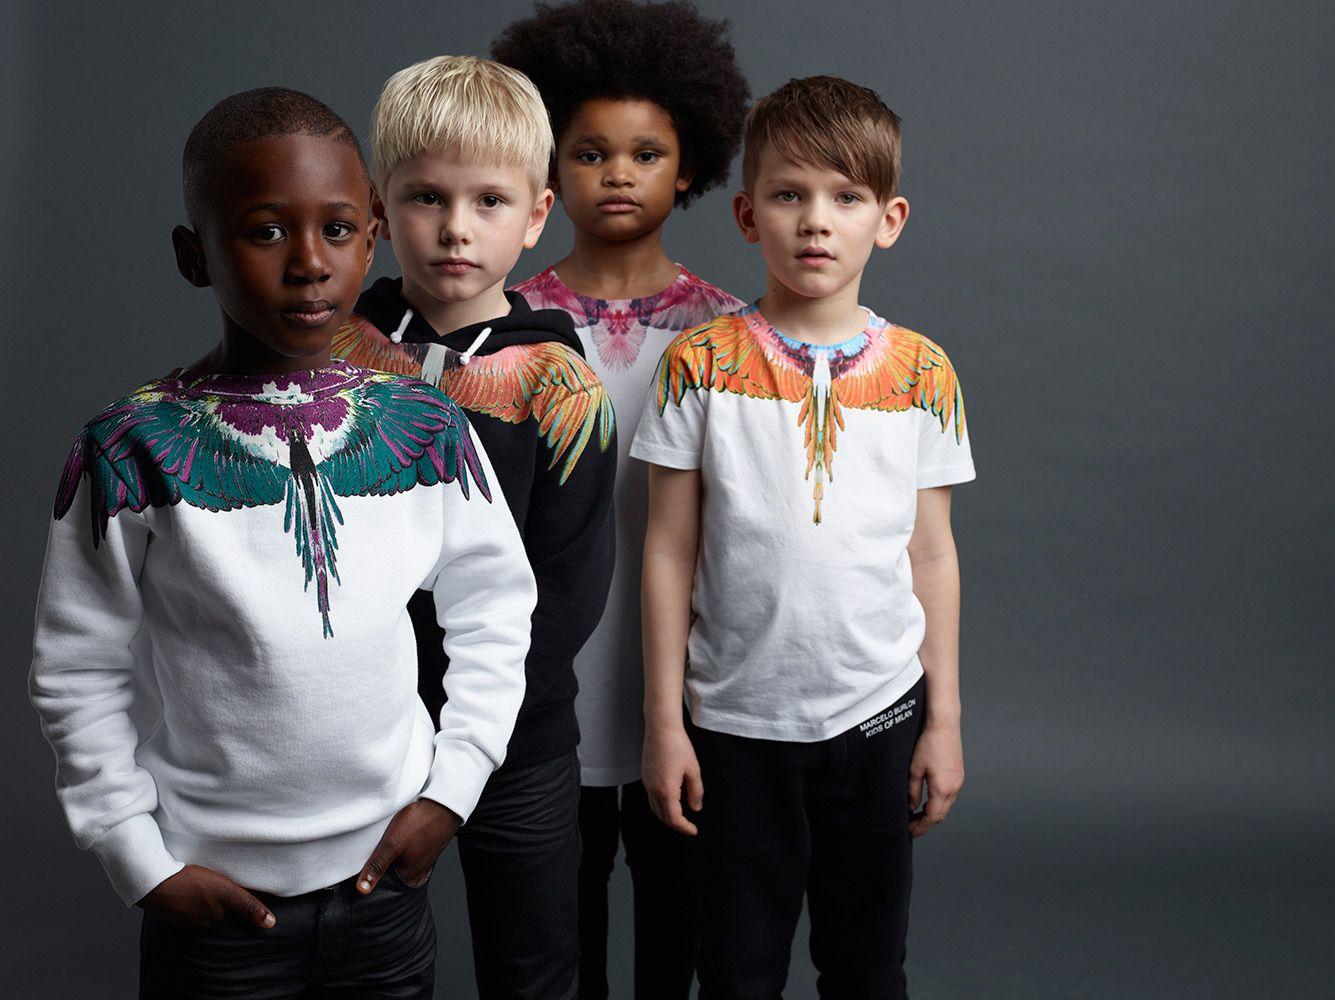 cbd483b49330 Kid s Wear - Marcelo Burlon Kids of Milan AW 2015 16